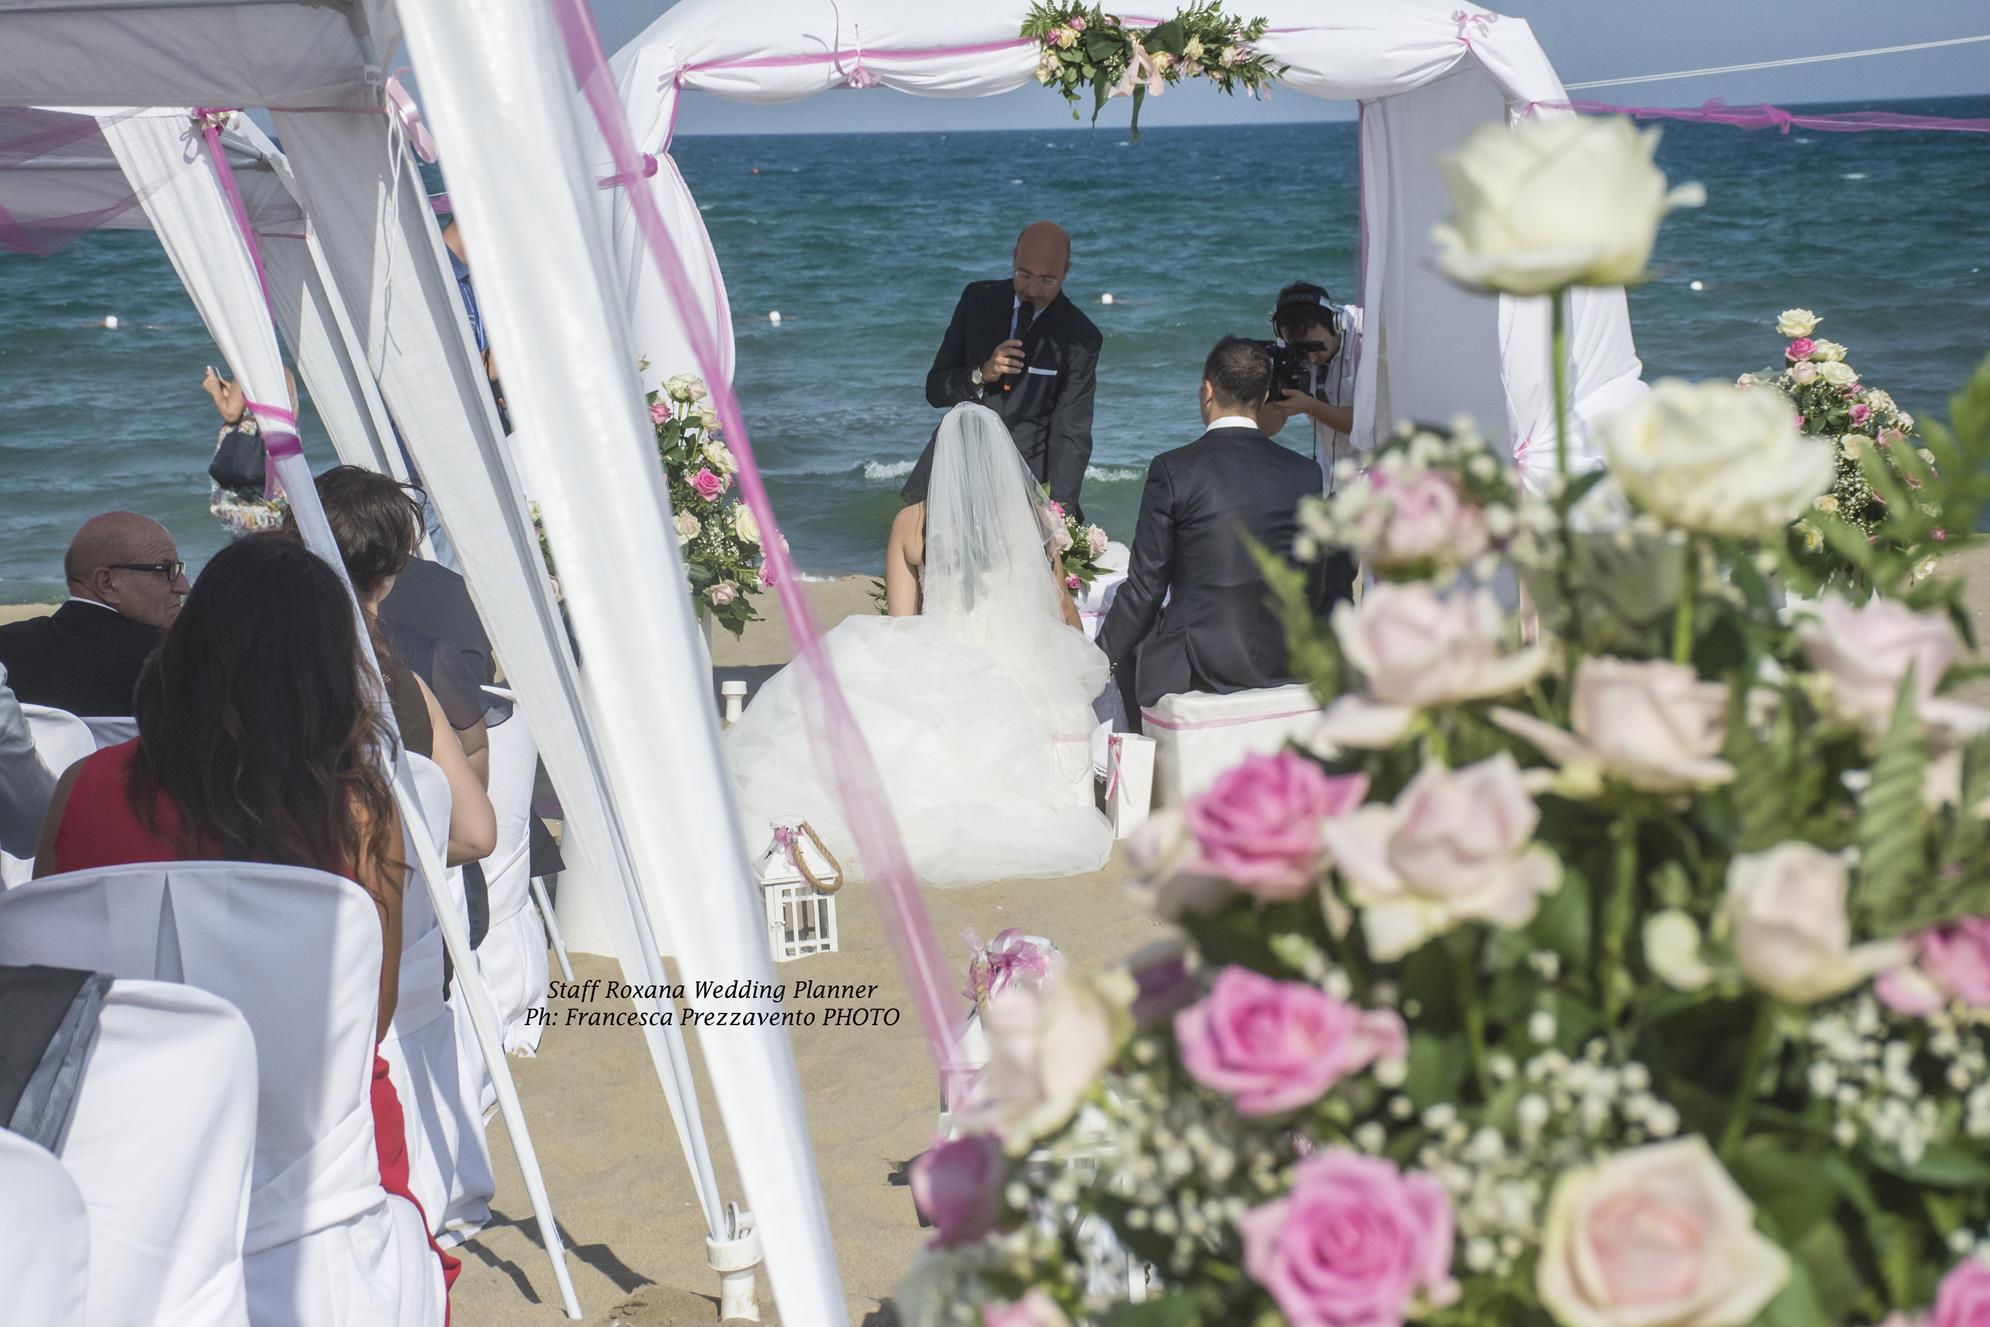 matrimonio-in-spiaggia-rosa